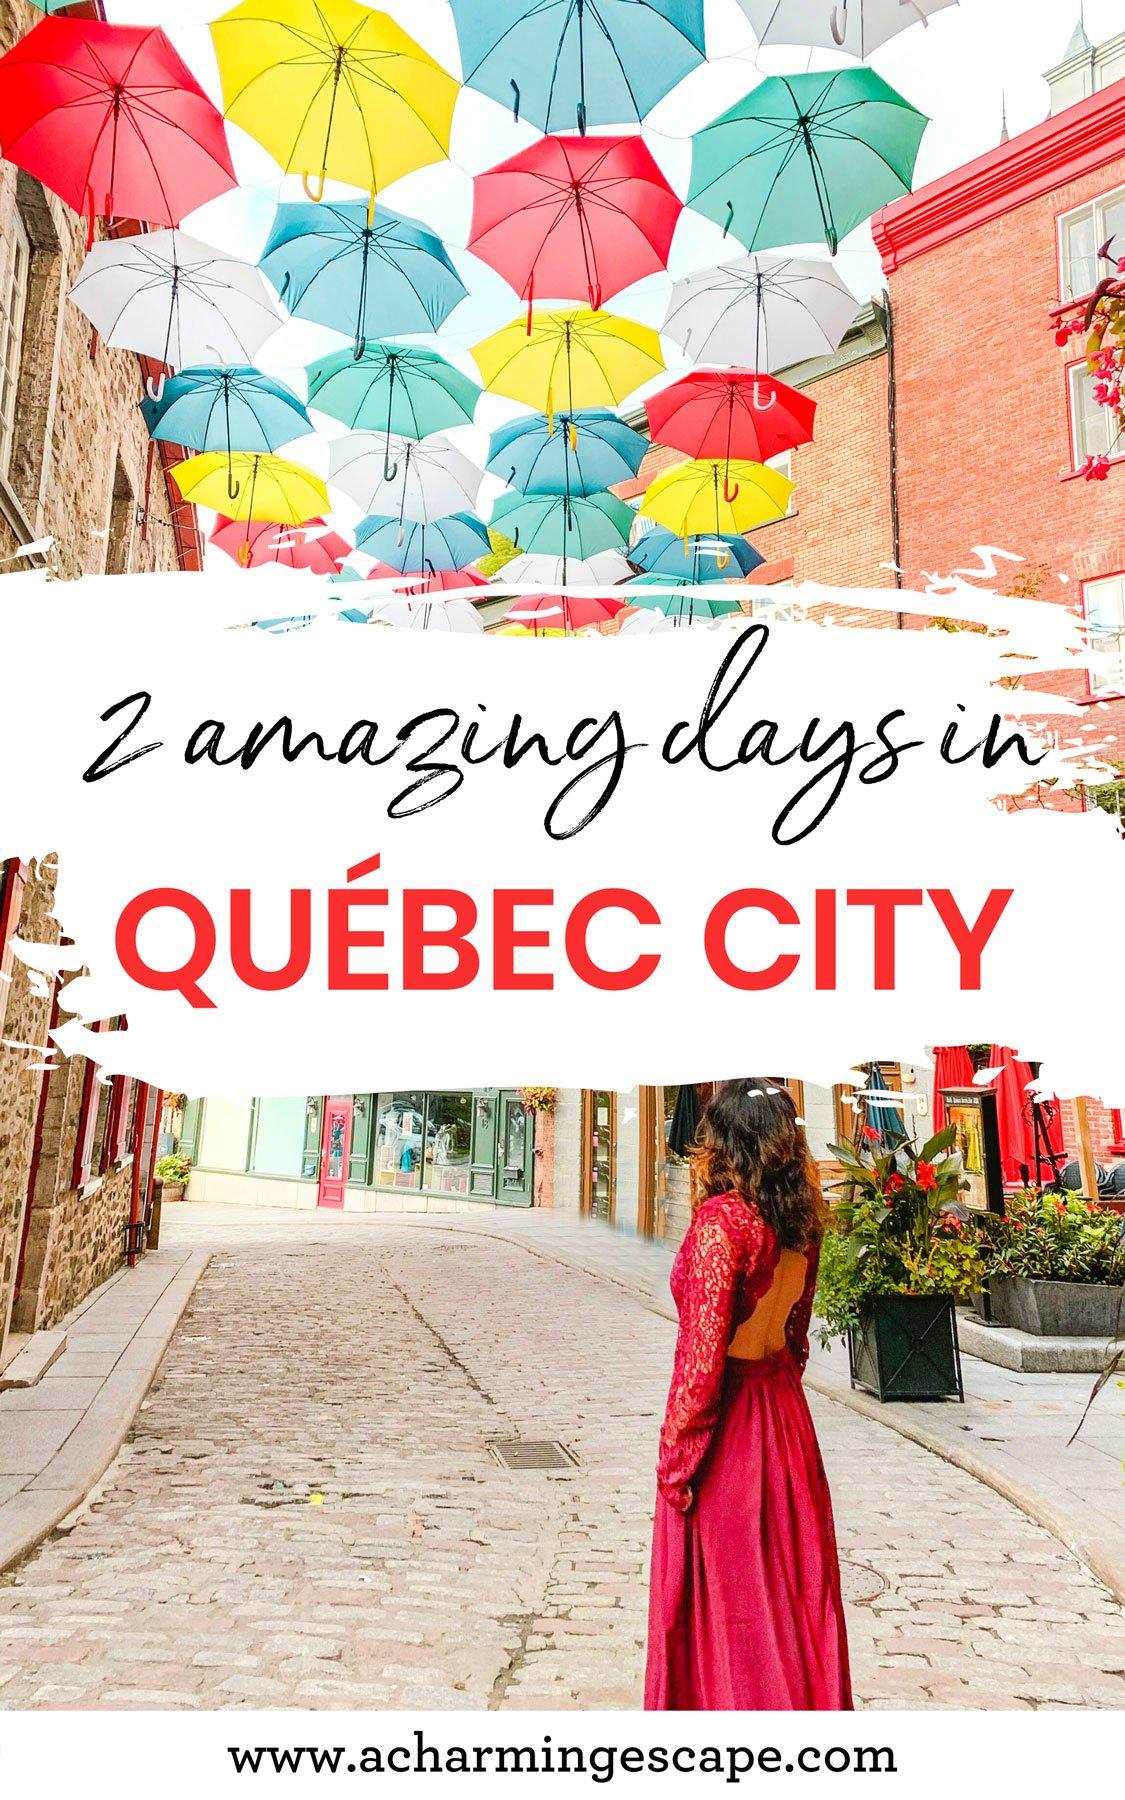 2 days in Quebec City